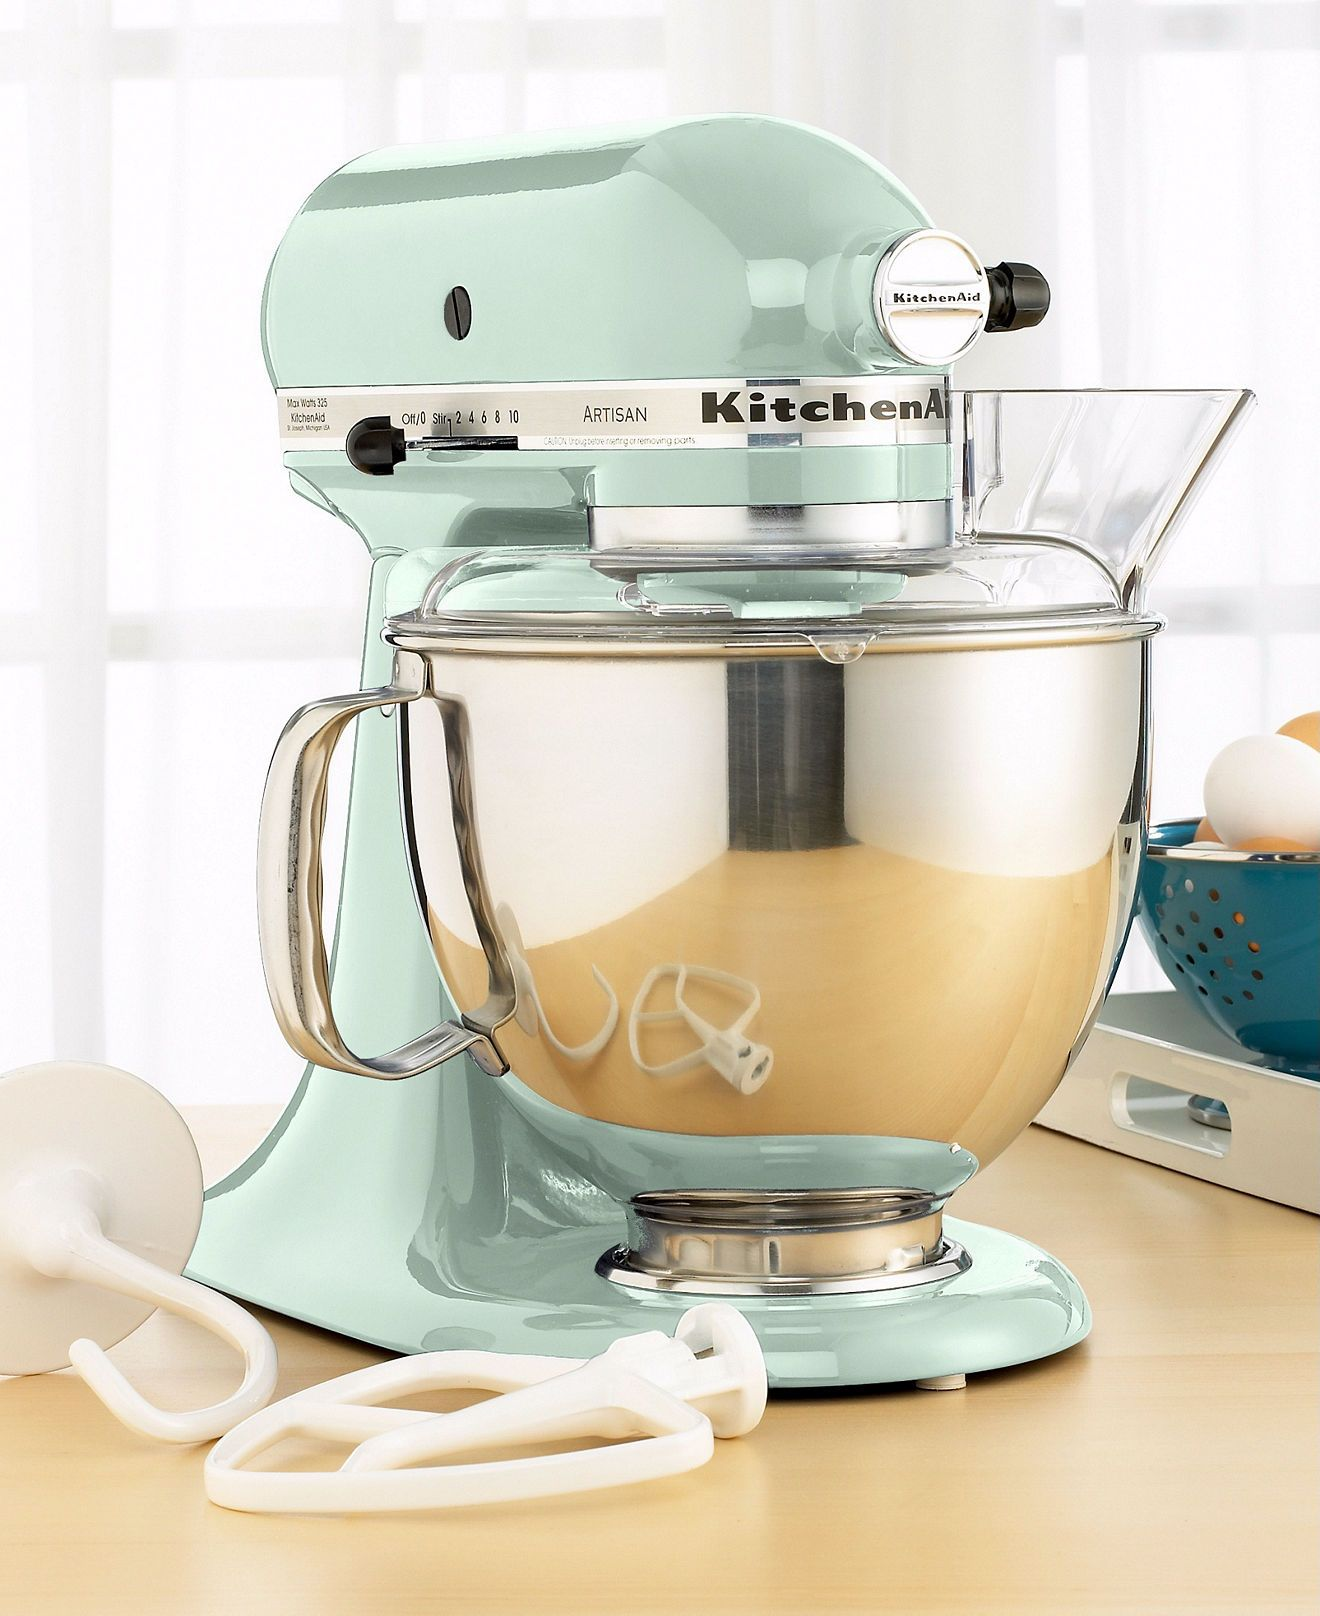 Kitchenaid artisan 5 qt stand mixer ksm150ps reviews